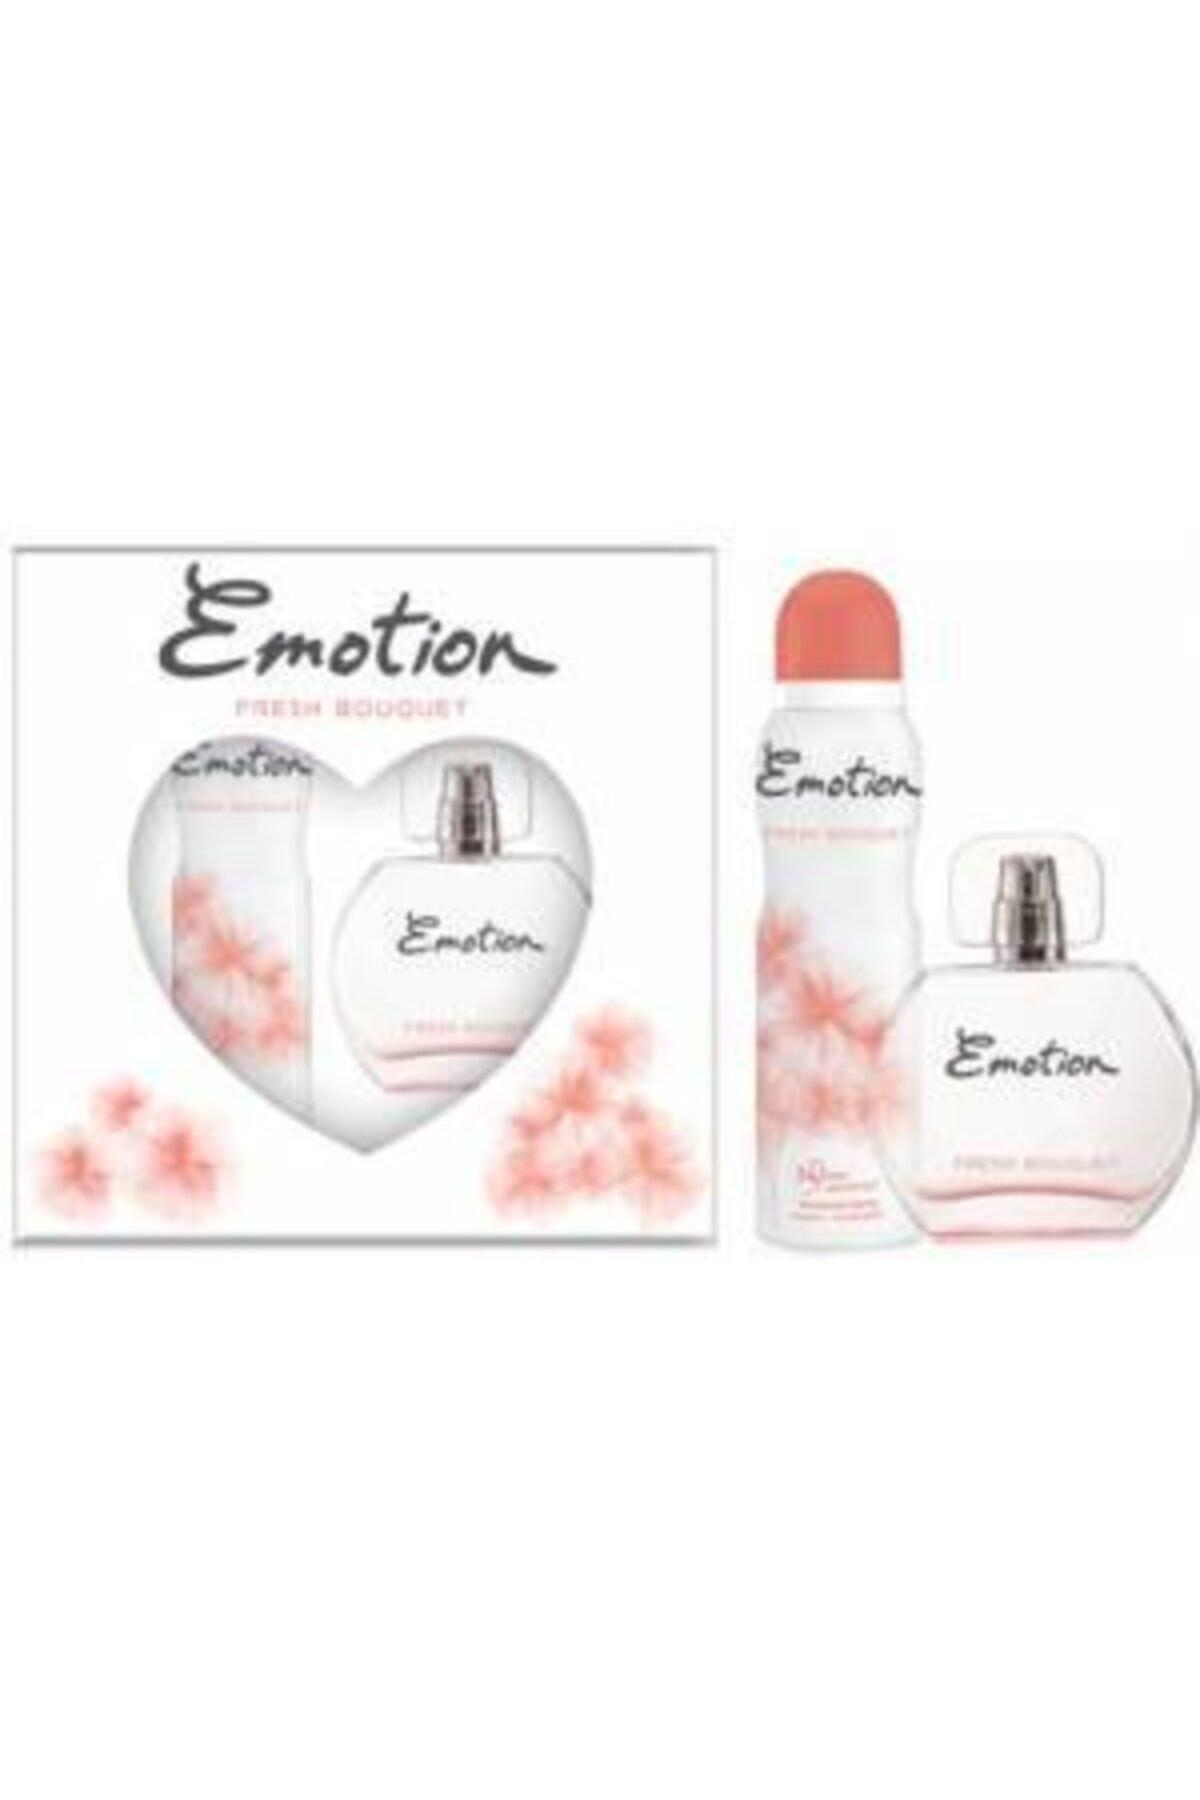 Emotion Fresh Bouqlet Bayan Edt 50 Ml + 150 Ml Deodorant Parfüm Seti 1